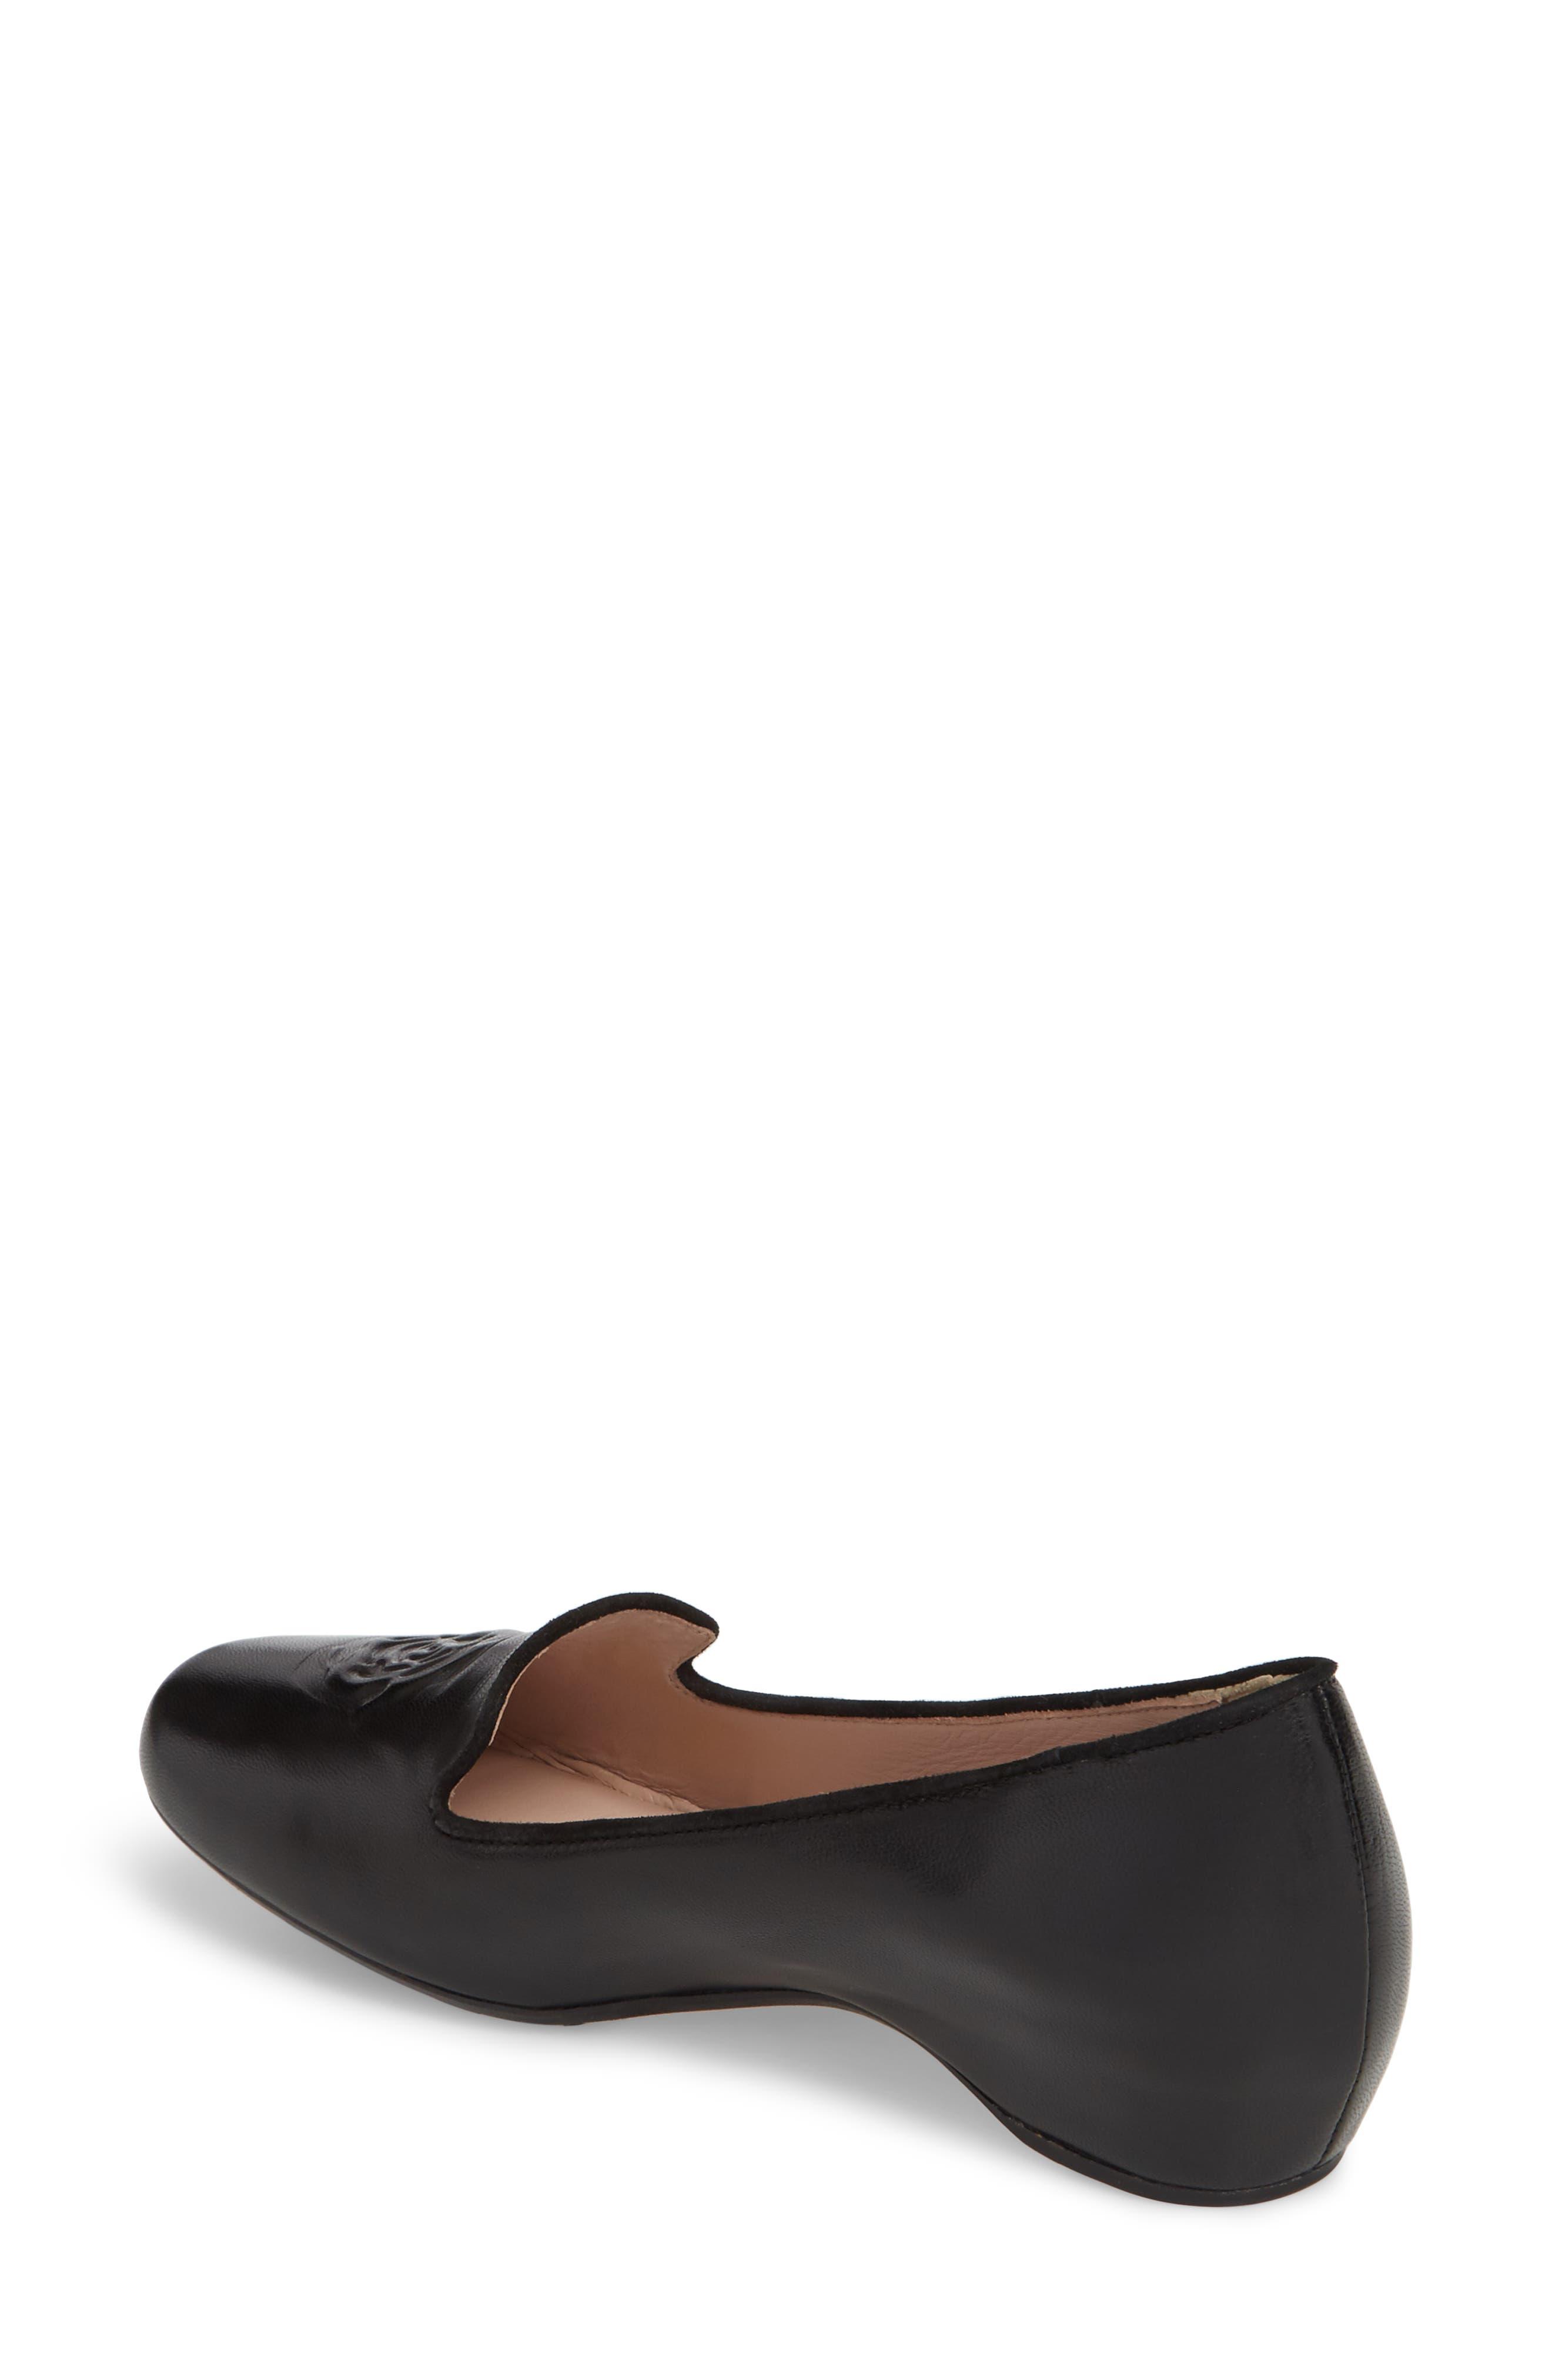 Taryn Rose Belissa Loafer,                             Alternate thumbnail 2, color,                             Black Leather